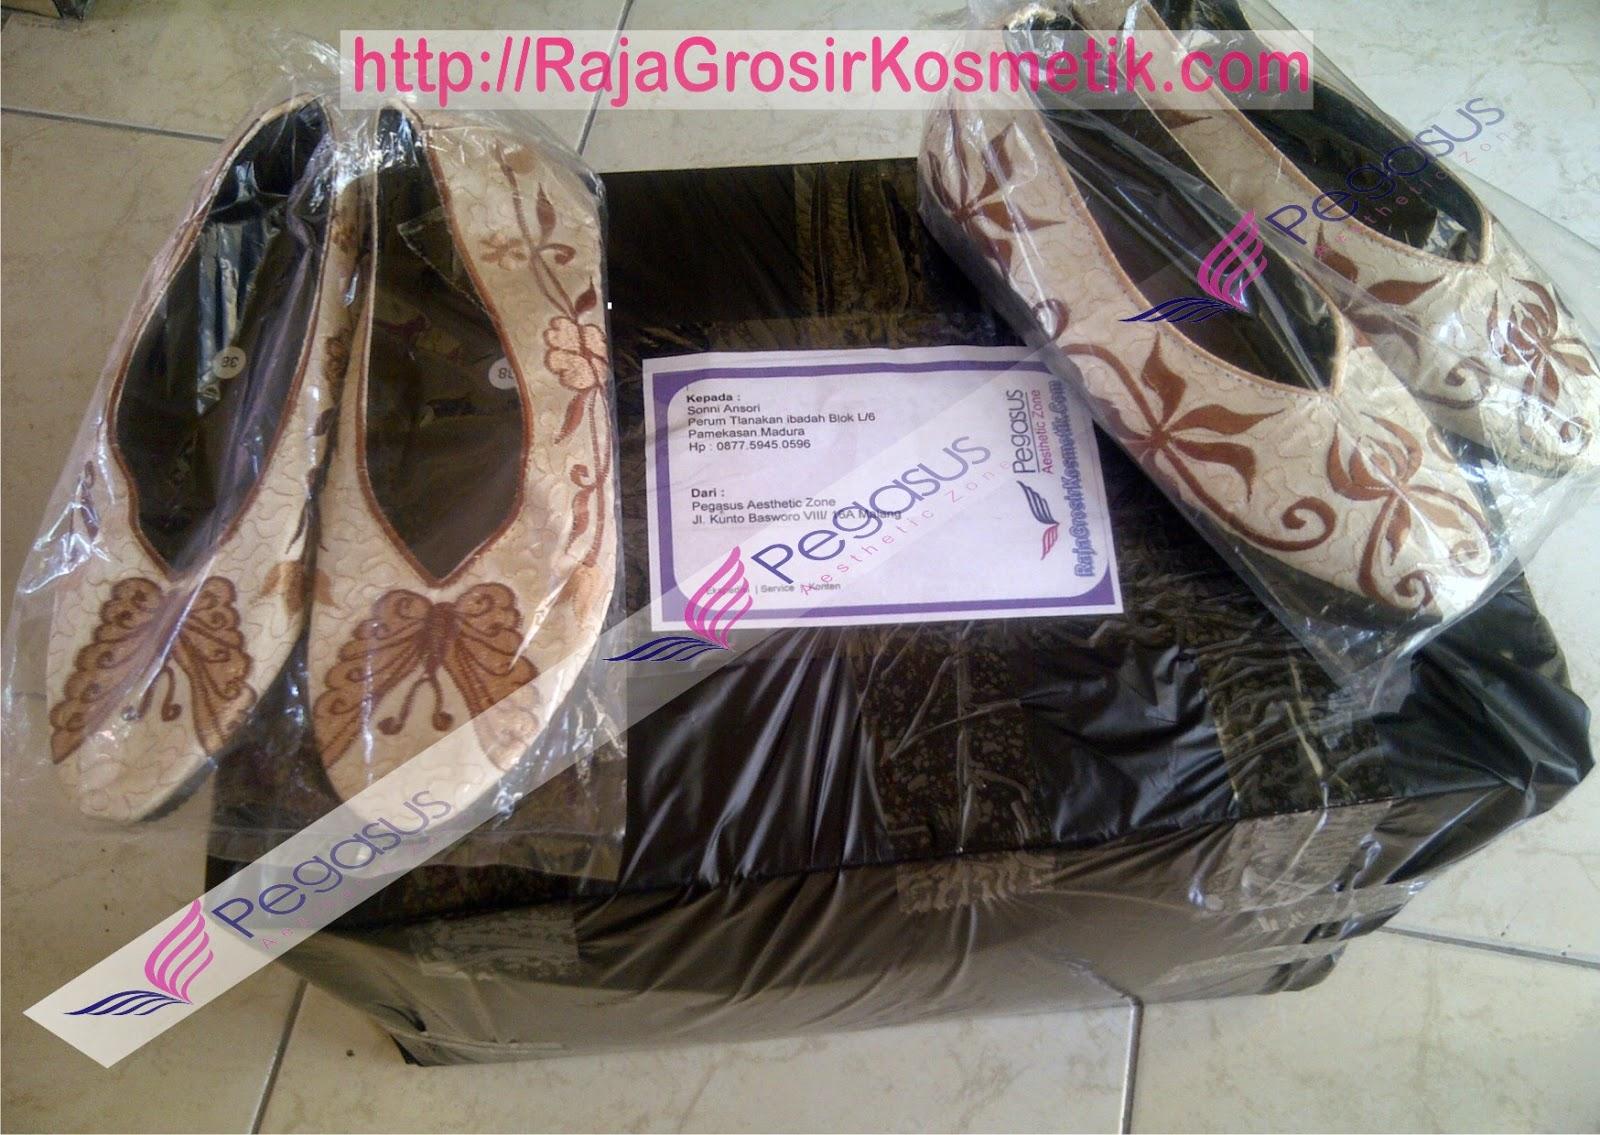 Grosir Sepatu Bordir Murah, Jual Sepatu Bordir Batik, Produsen Sepatu Bordir Bangil, +62.8564.993.7987